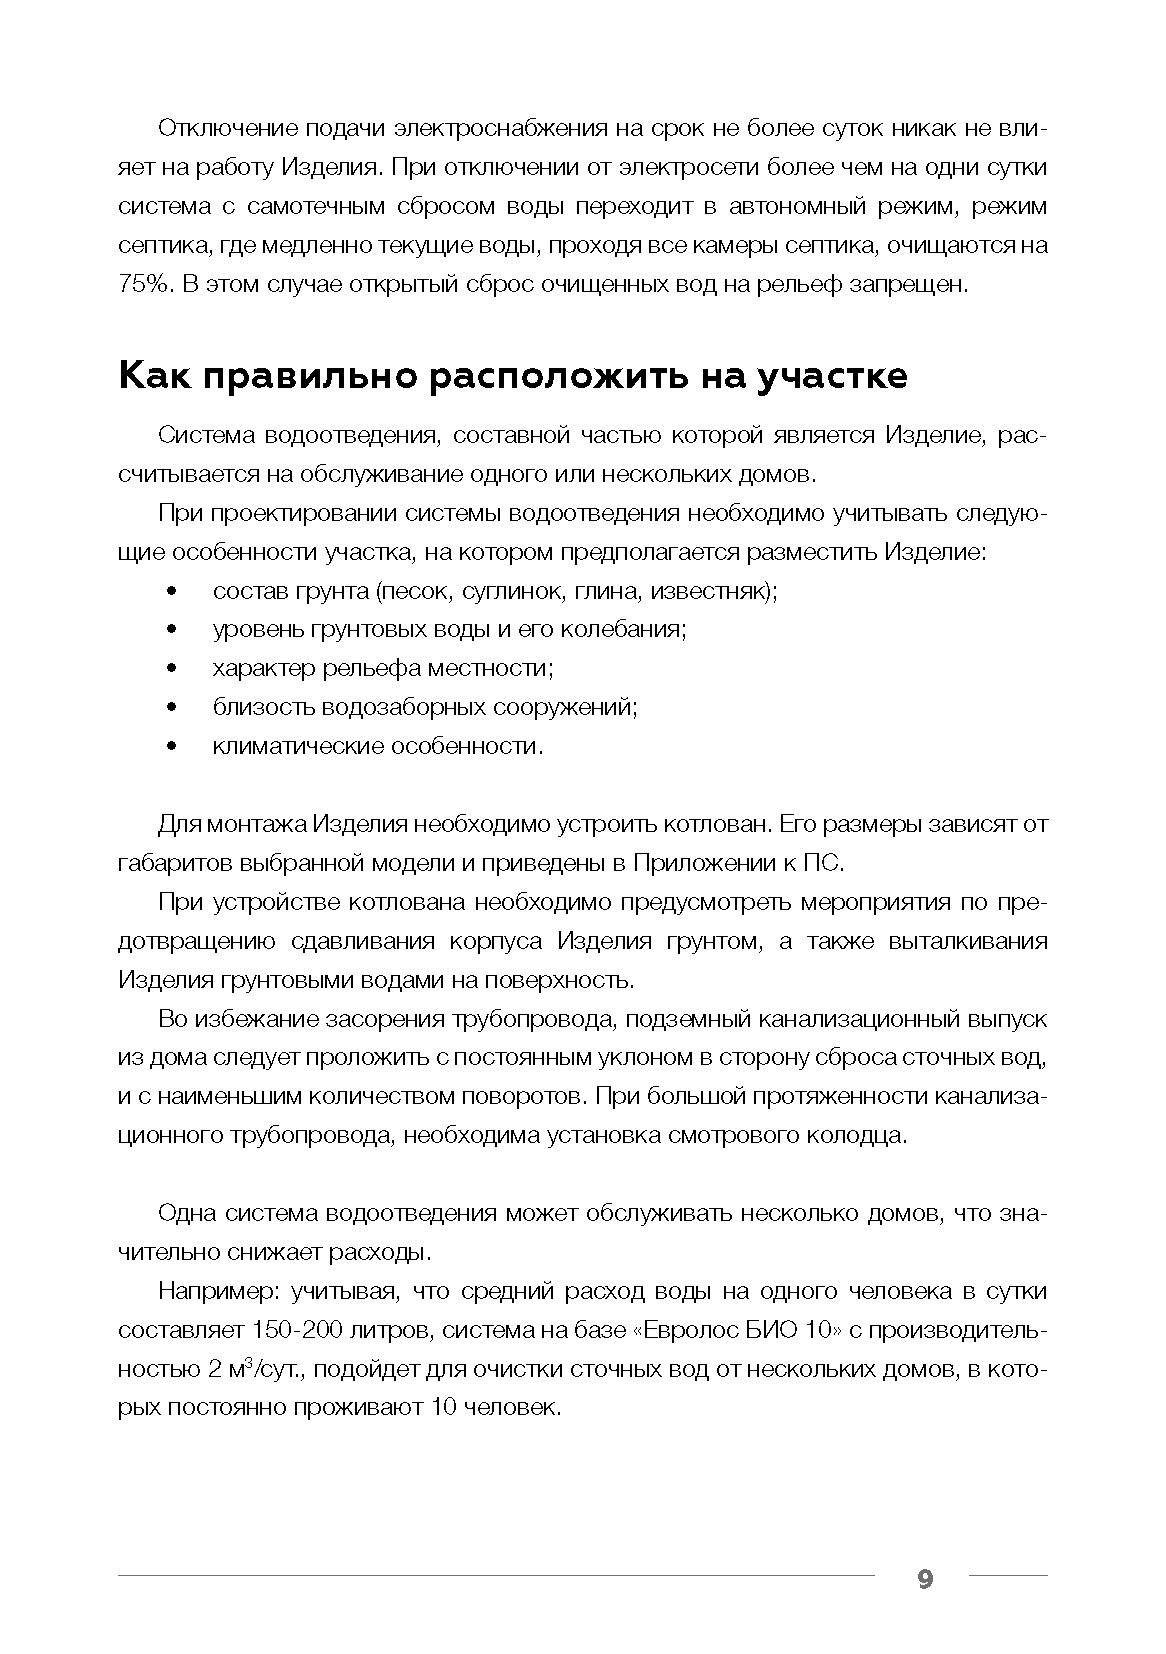 Технический паспорт Евролос Био_Страница_11